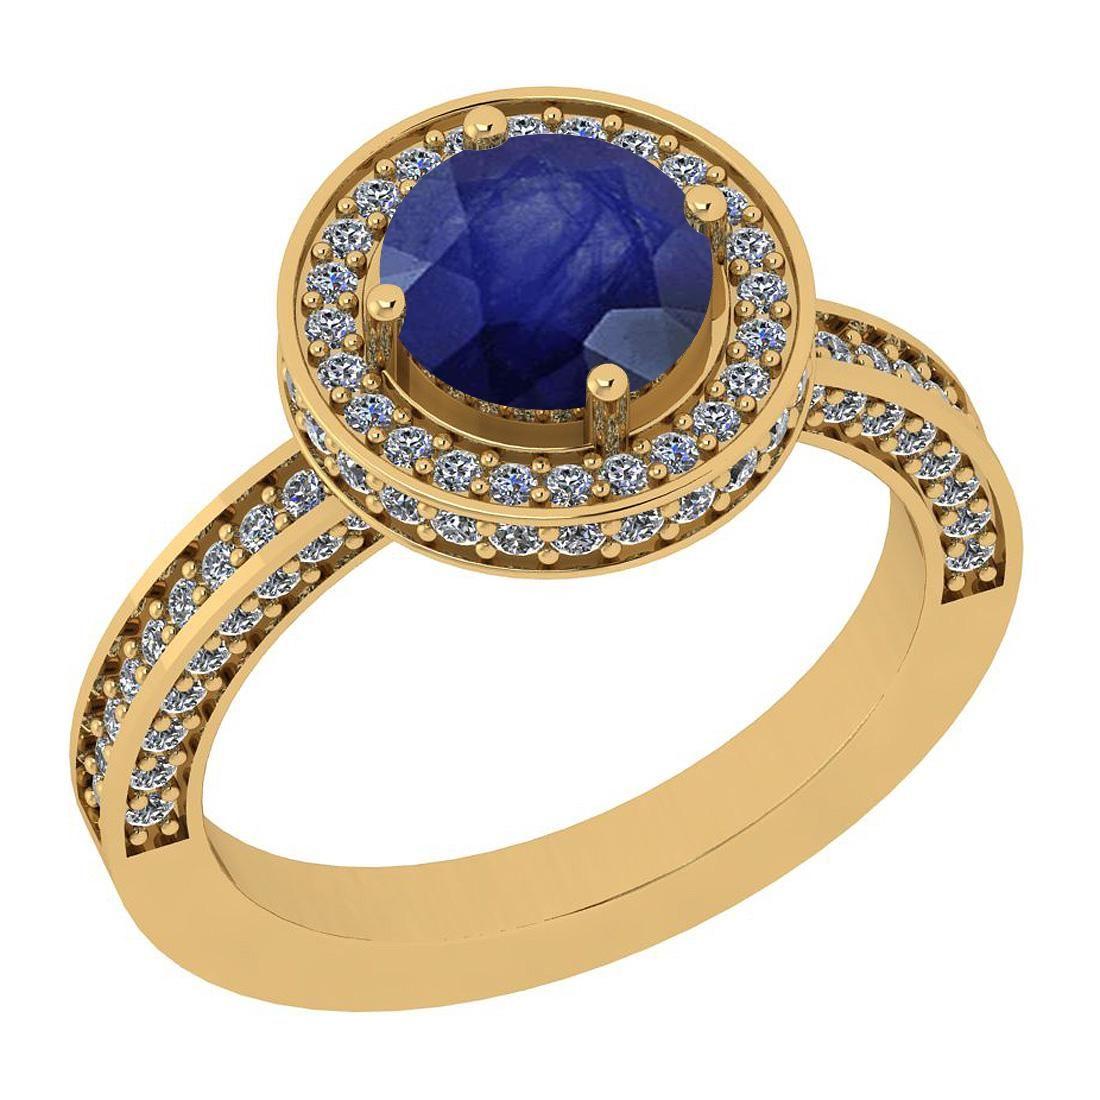 2.13 Ctw I2/I3 Blue Sapphire And Diamond 14K Yellow Gol